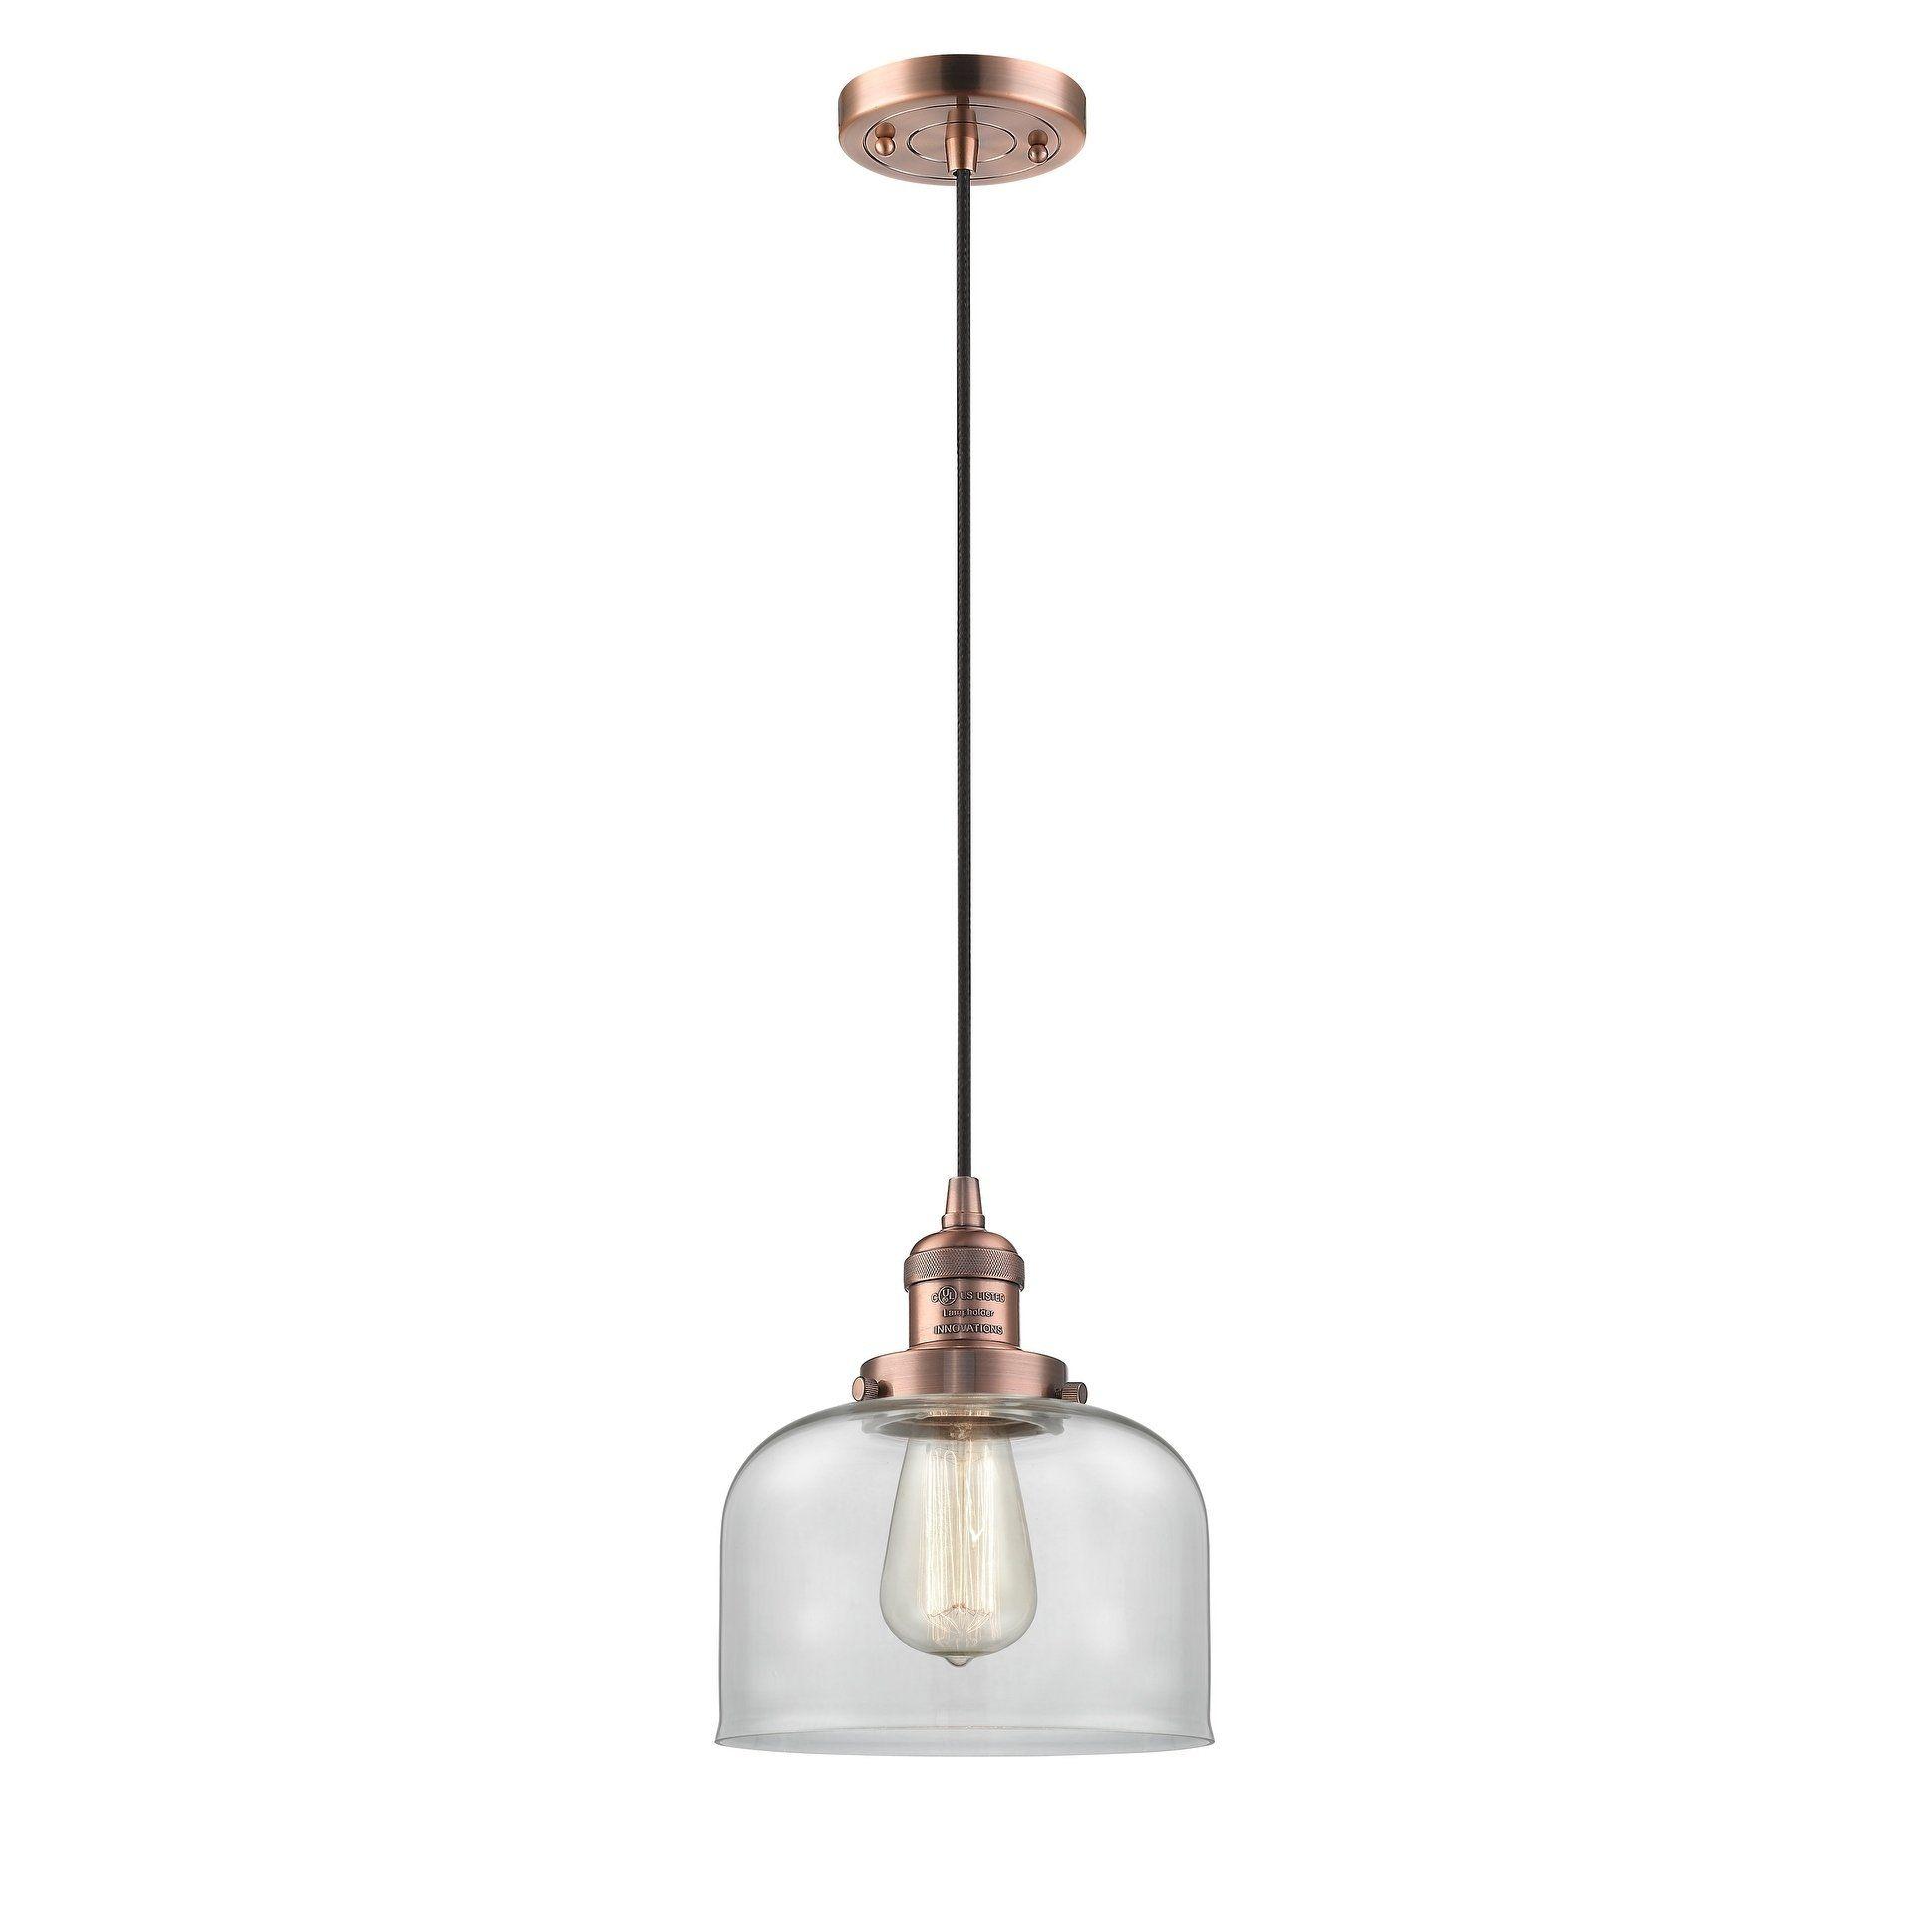 Innovations Lighting Large Bell 1 Light Adjustable Cord Mini Pendant Pendant Lighting Track Lighting Fixtures Polished Nickel